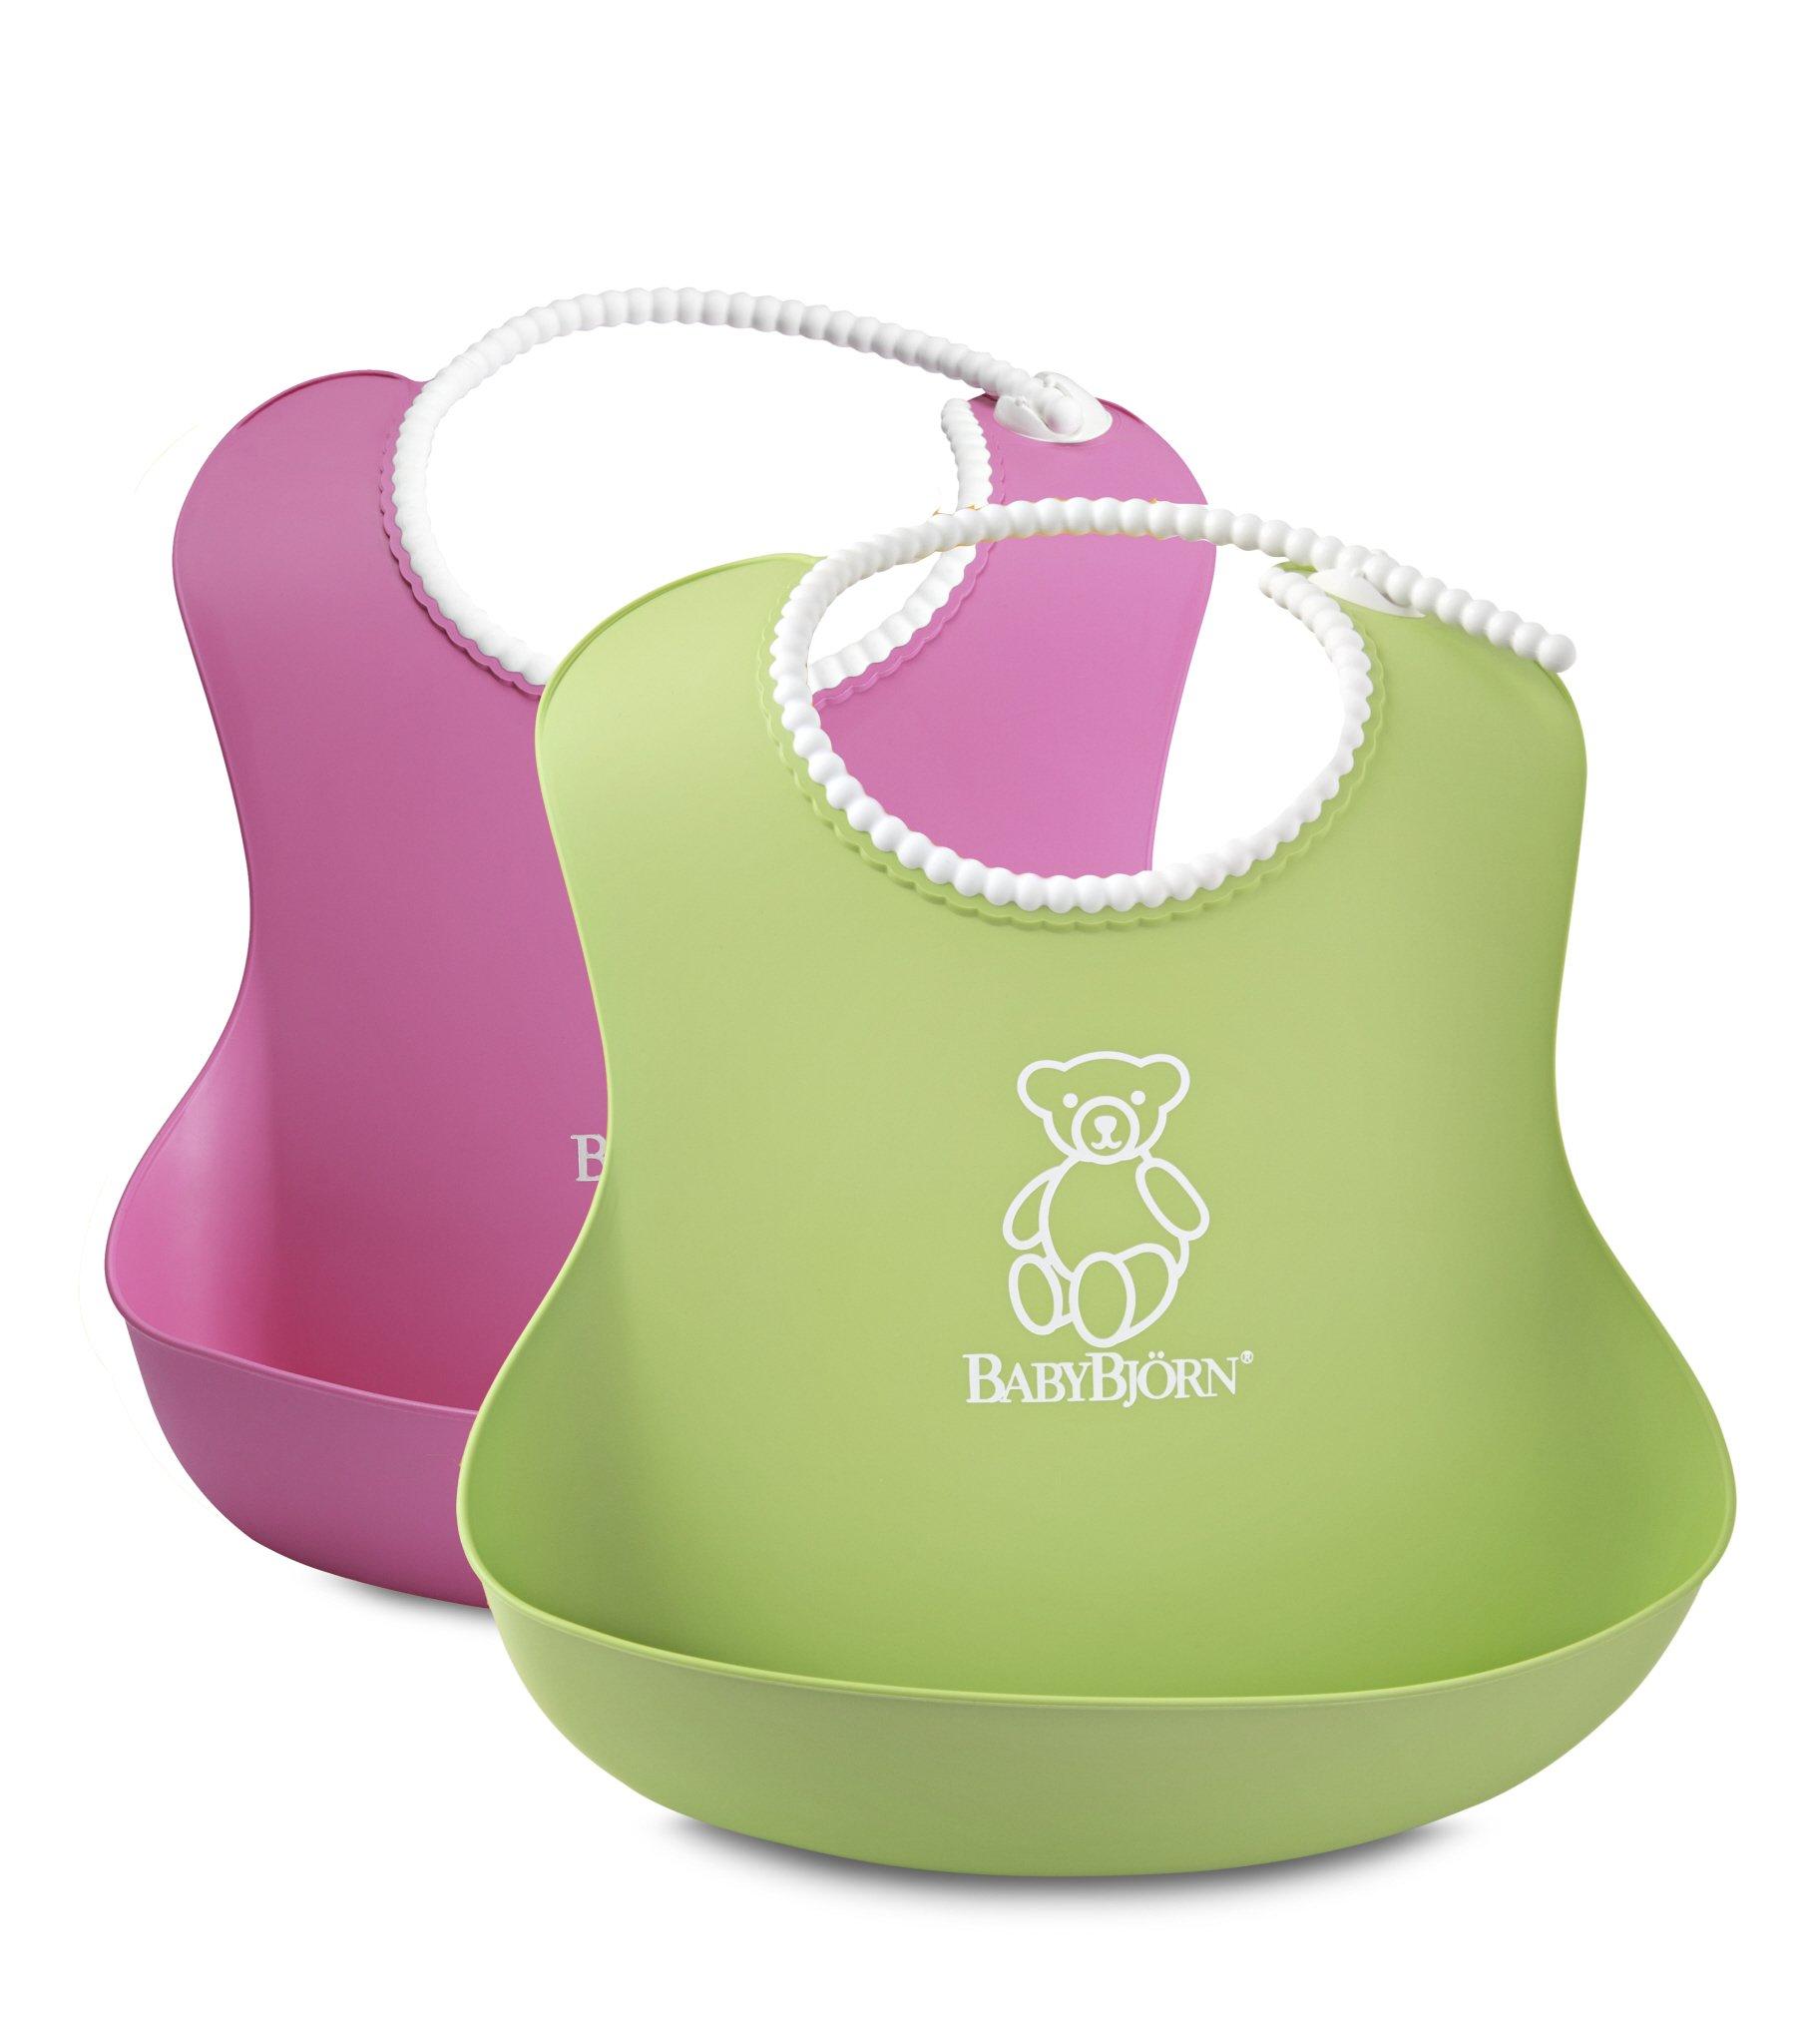 BABYBJORN Soft Bib - Pink/Green (2 Pack) by BabyBjörn